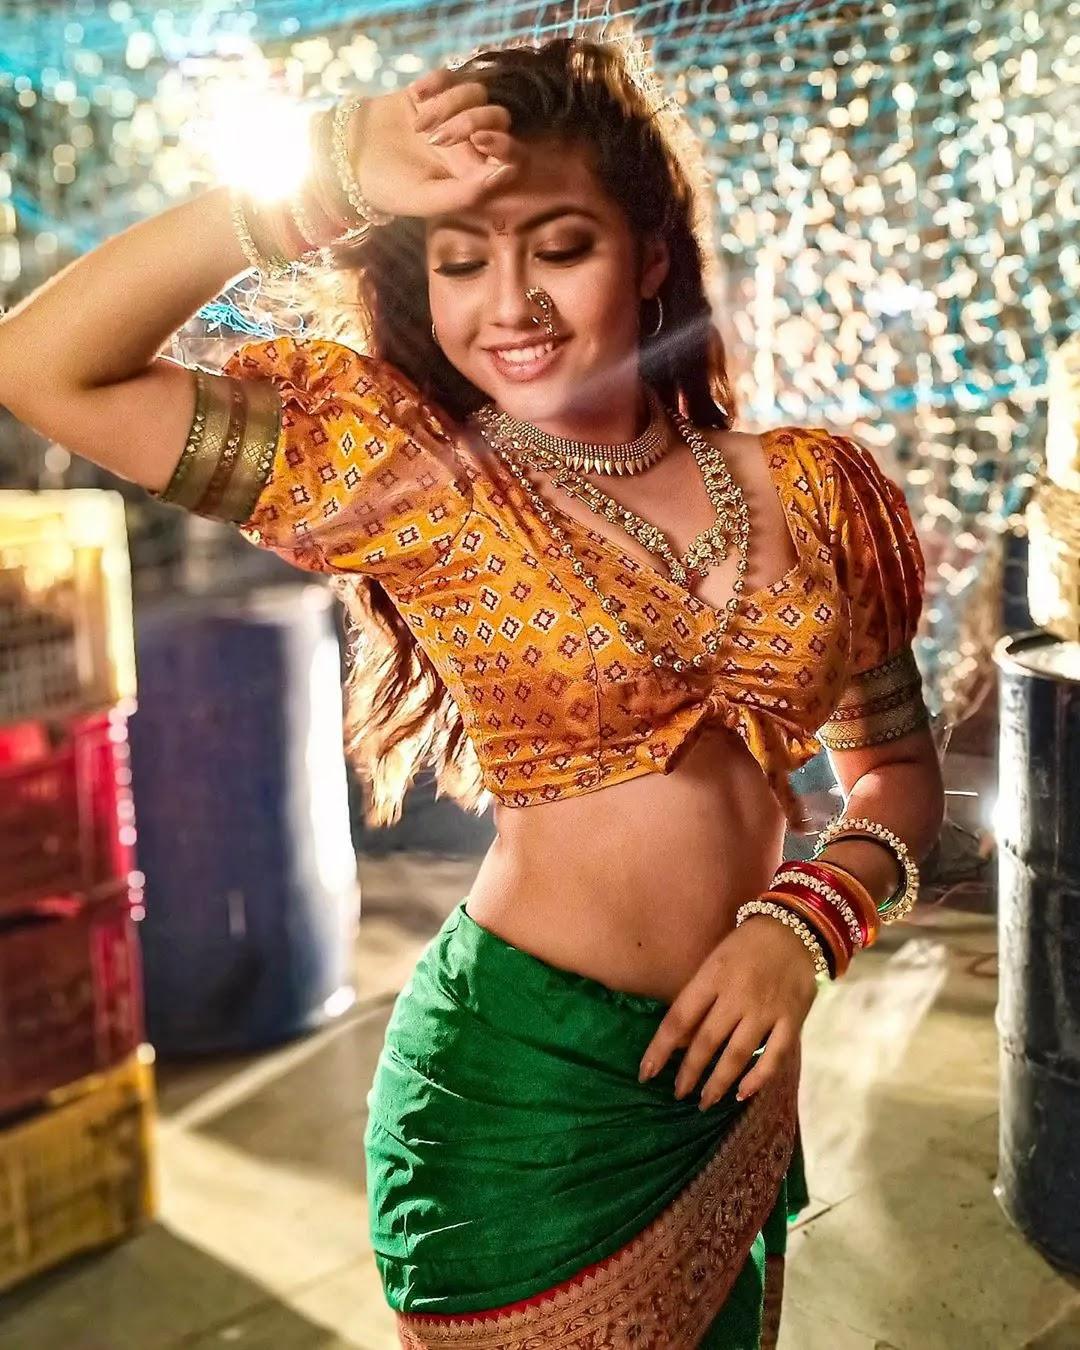 reem shaikh marathi look photo in saree